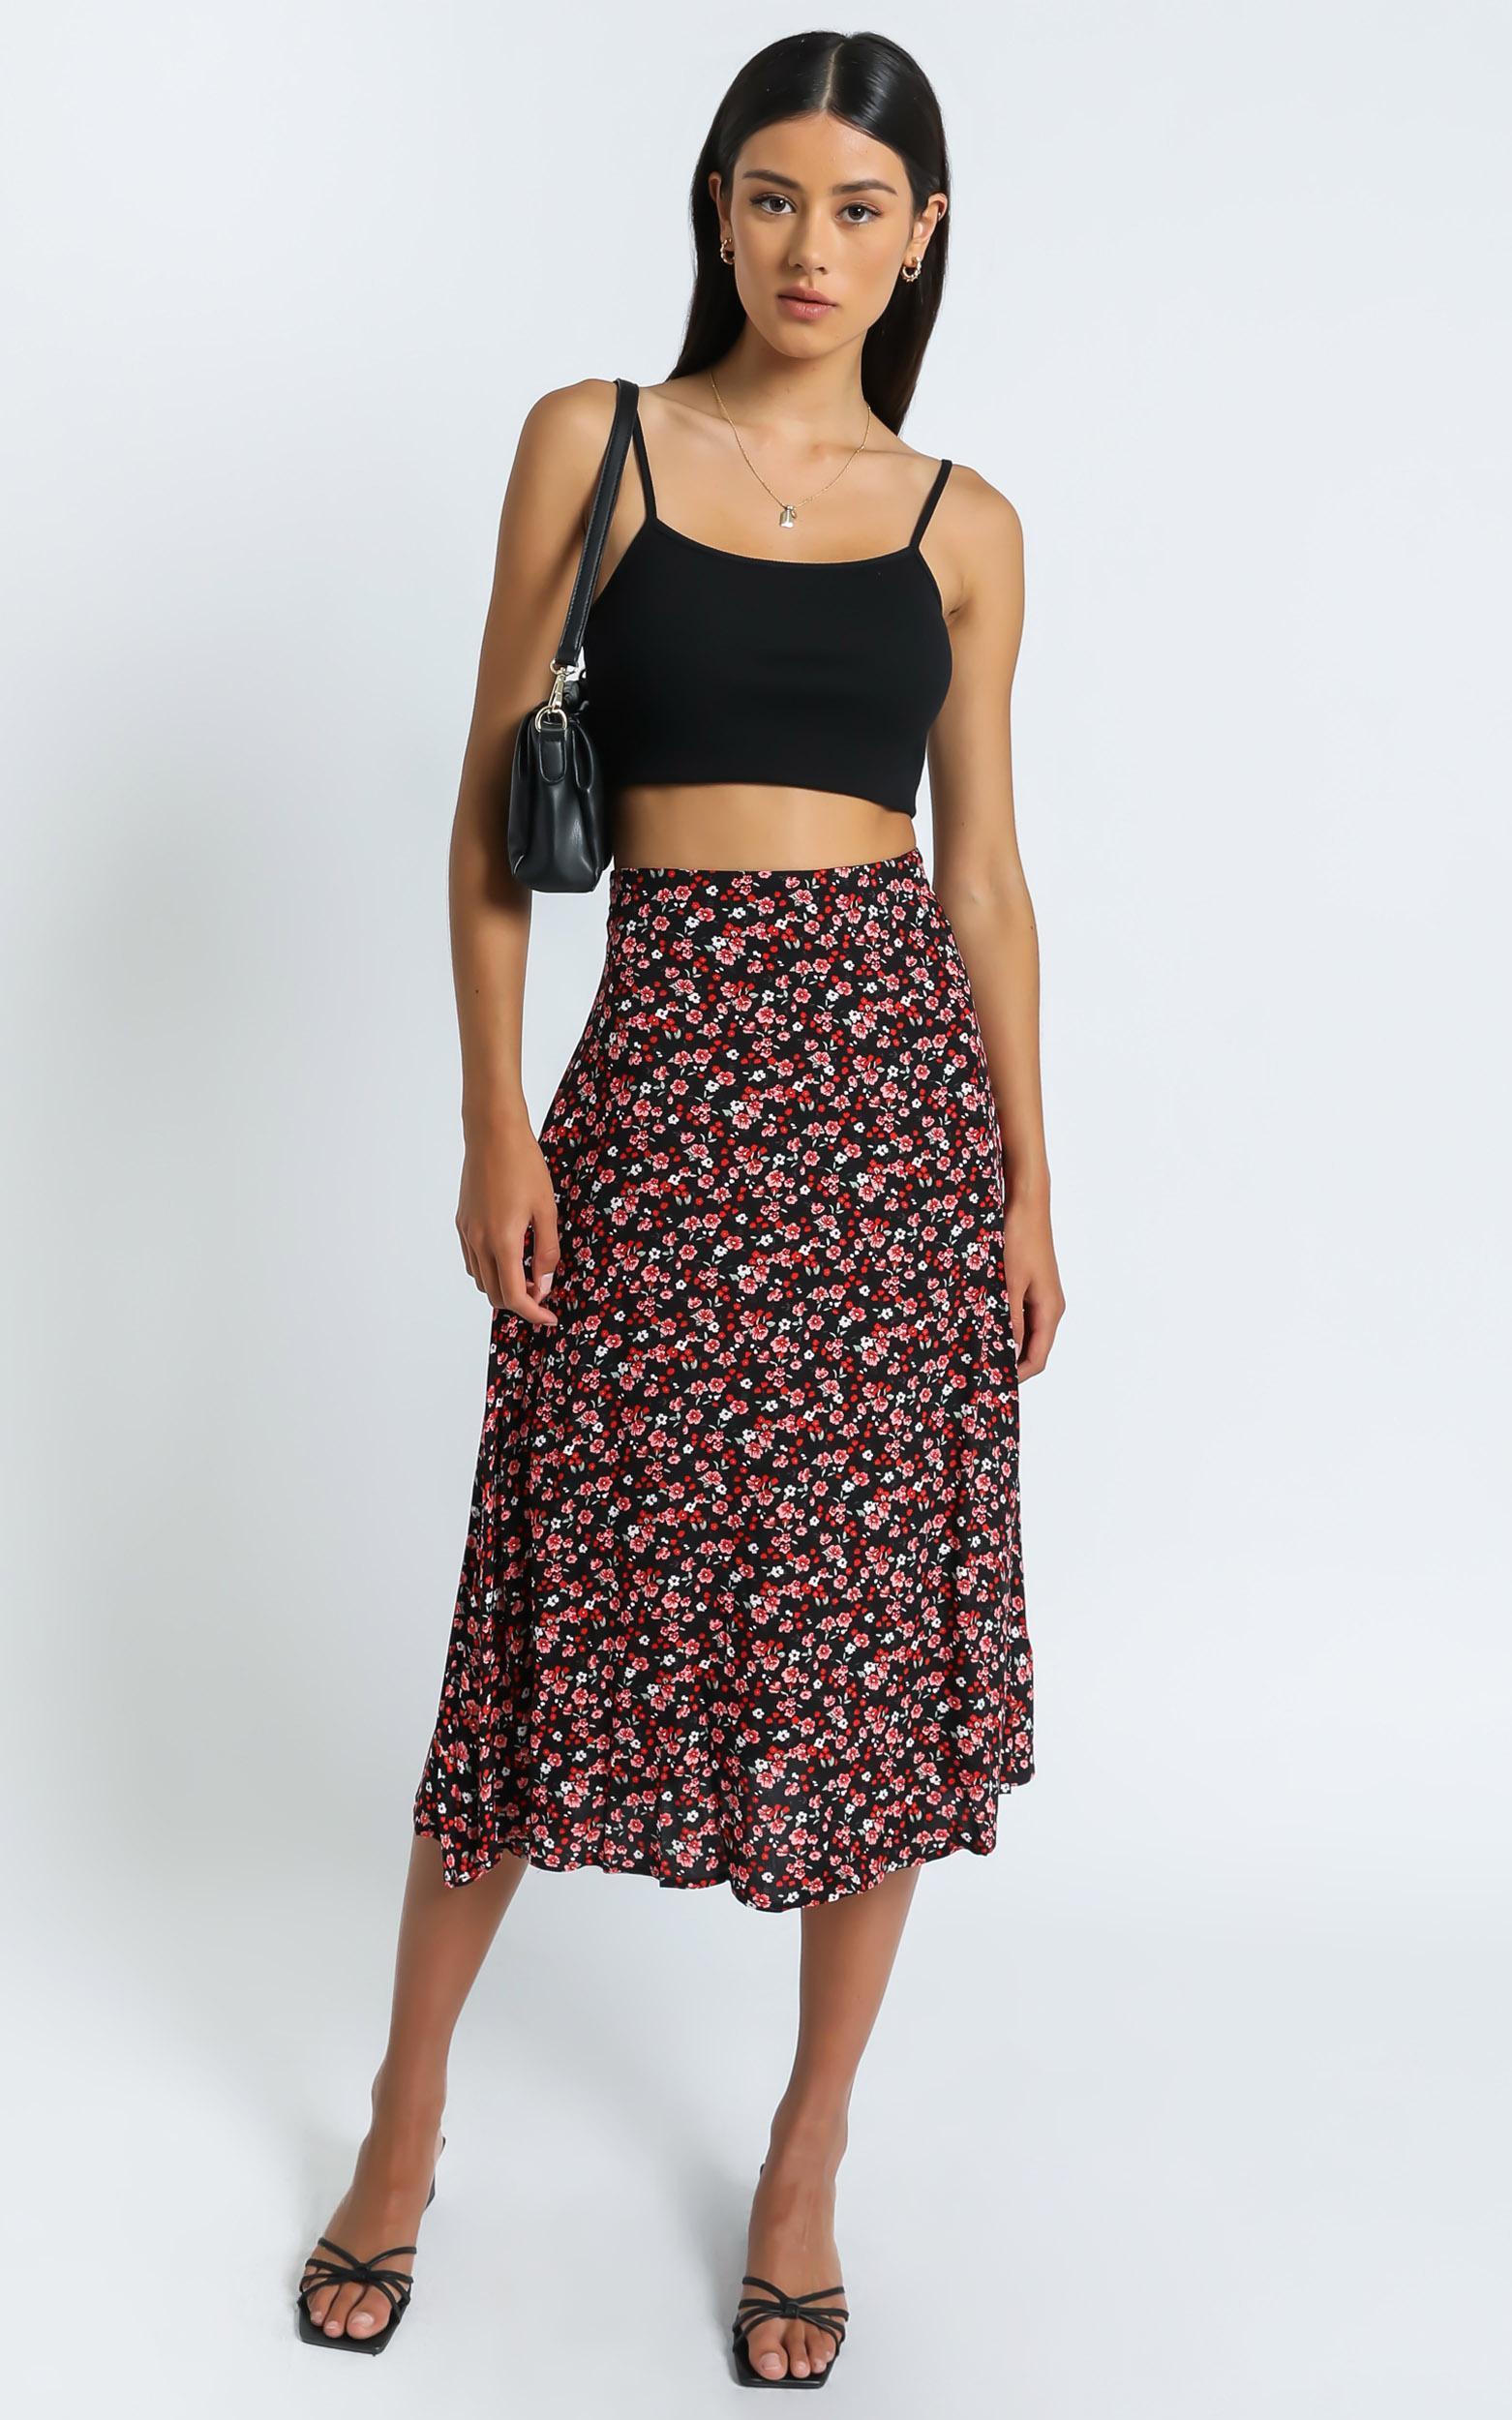 Kourtney Skirt in Black Floral - 6 (XS), Multi, hi-res image number null